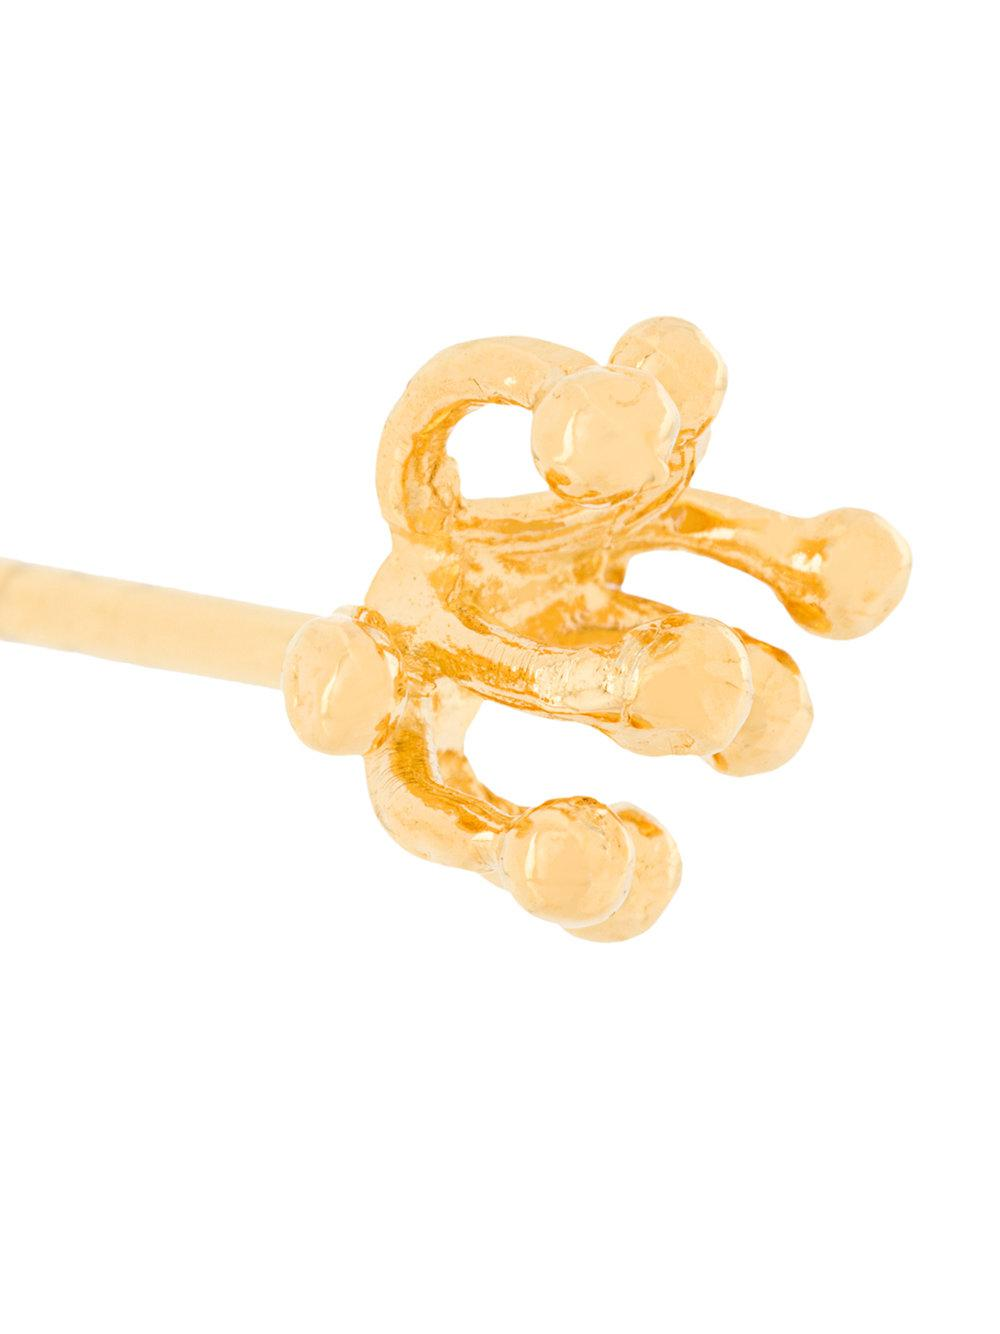 Wouters & Hendrix My Favourite cluster stud earrings - Metallic uj5eXBeMPC